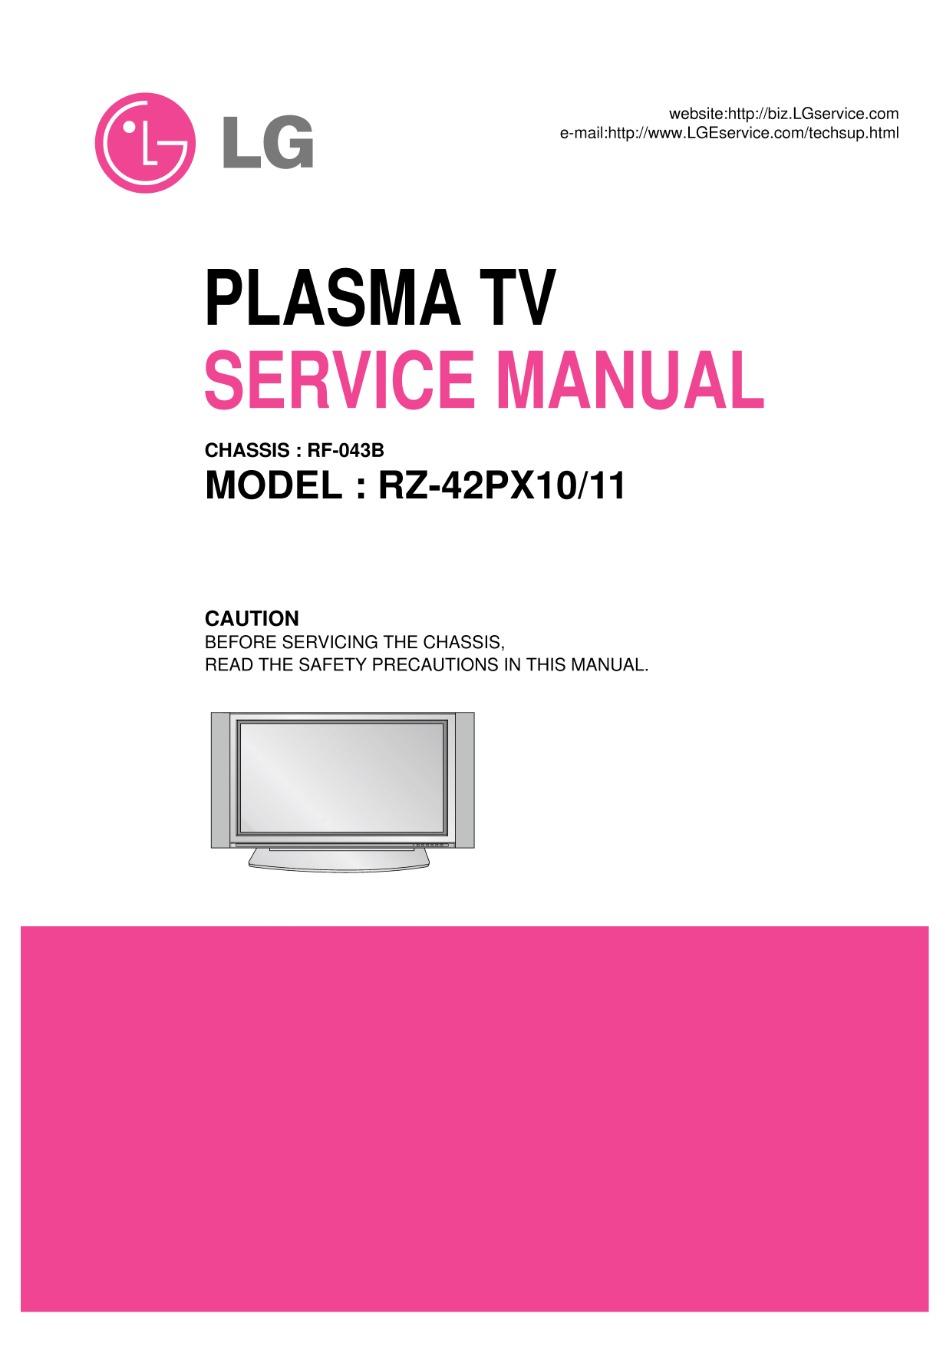 Lg rz42px11 service manual download, schematics, eeprom, repair.